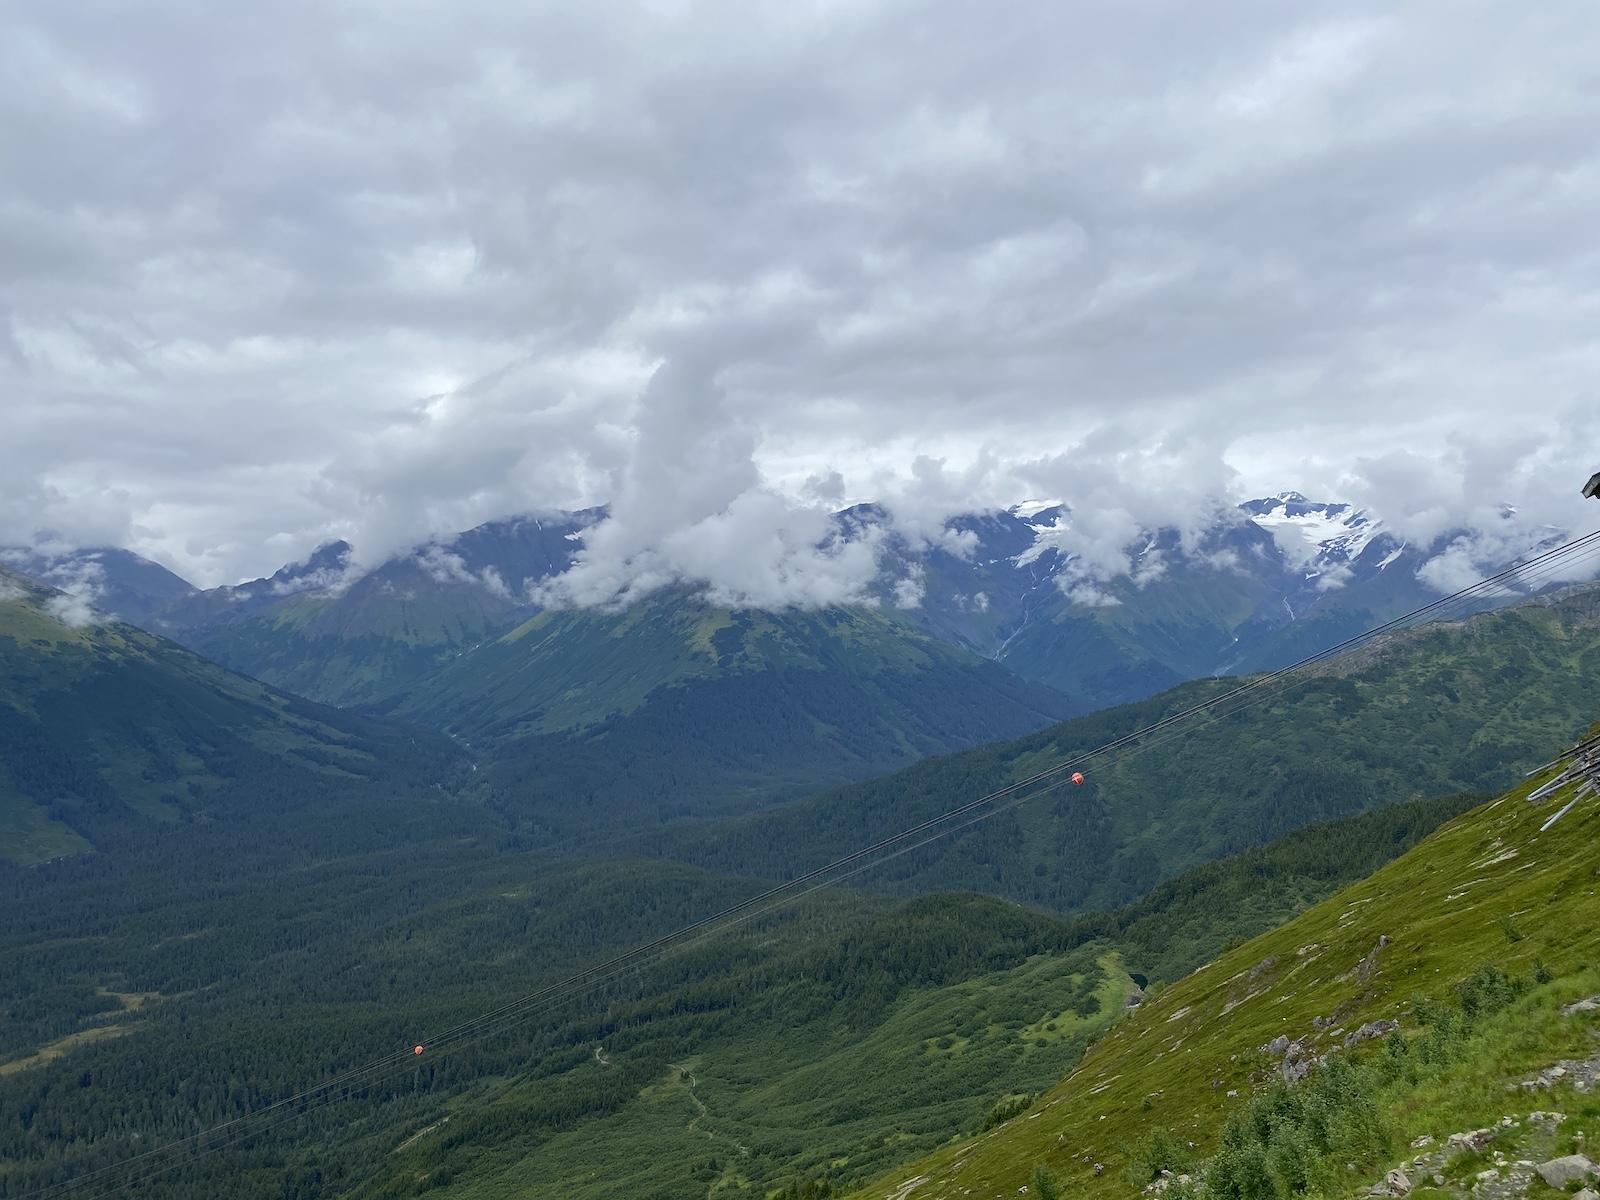 View from the Aerial Tram at Ayleska